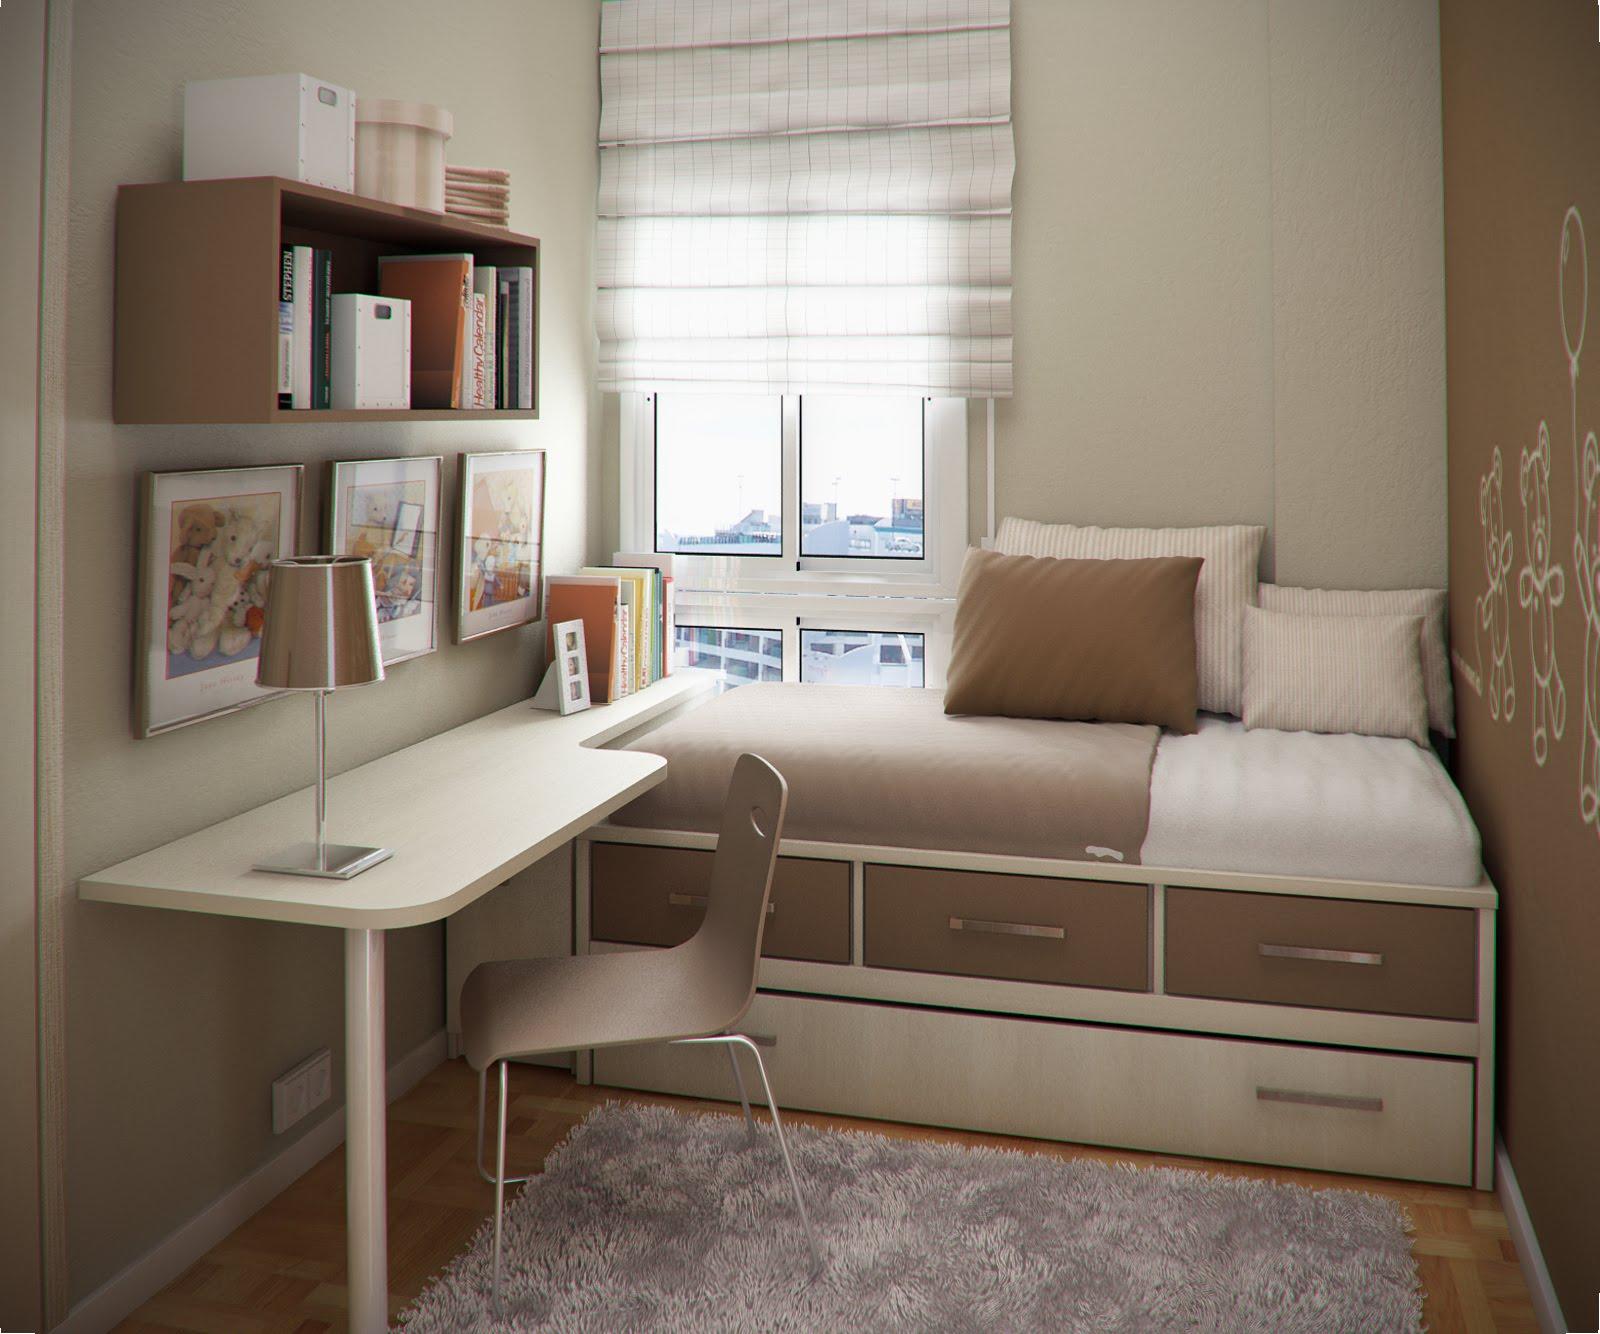 modern lokum pomys y na ma y w ski pok j dziecka. Black Bedroom Furniture Sets. Home Design Ideas